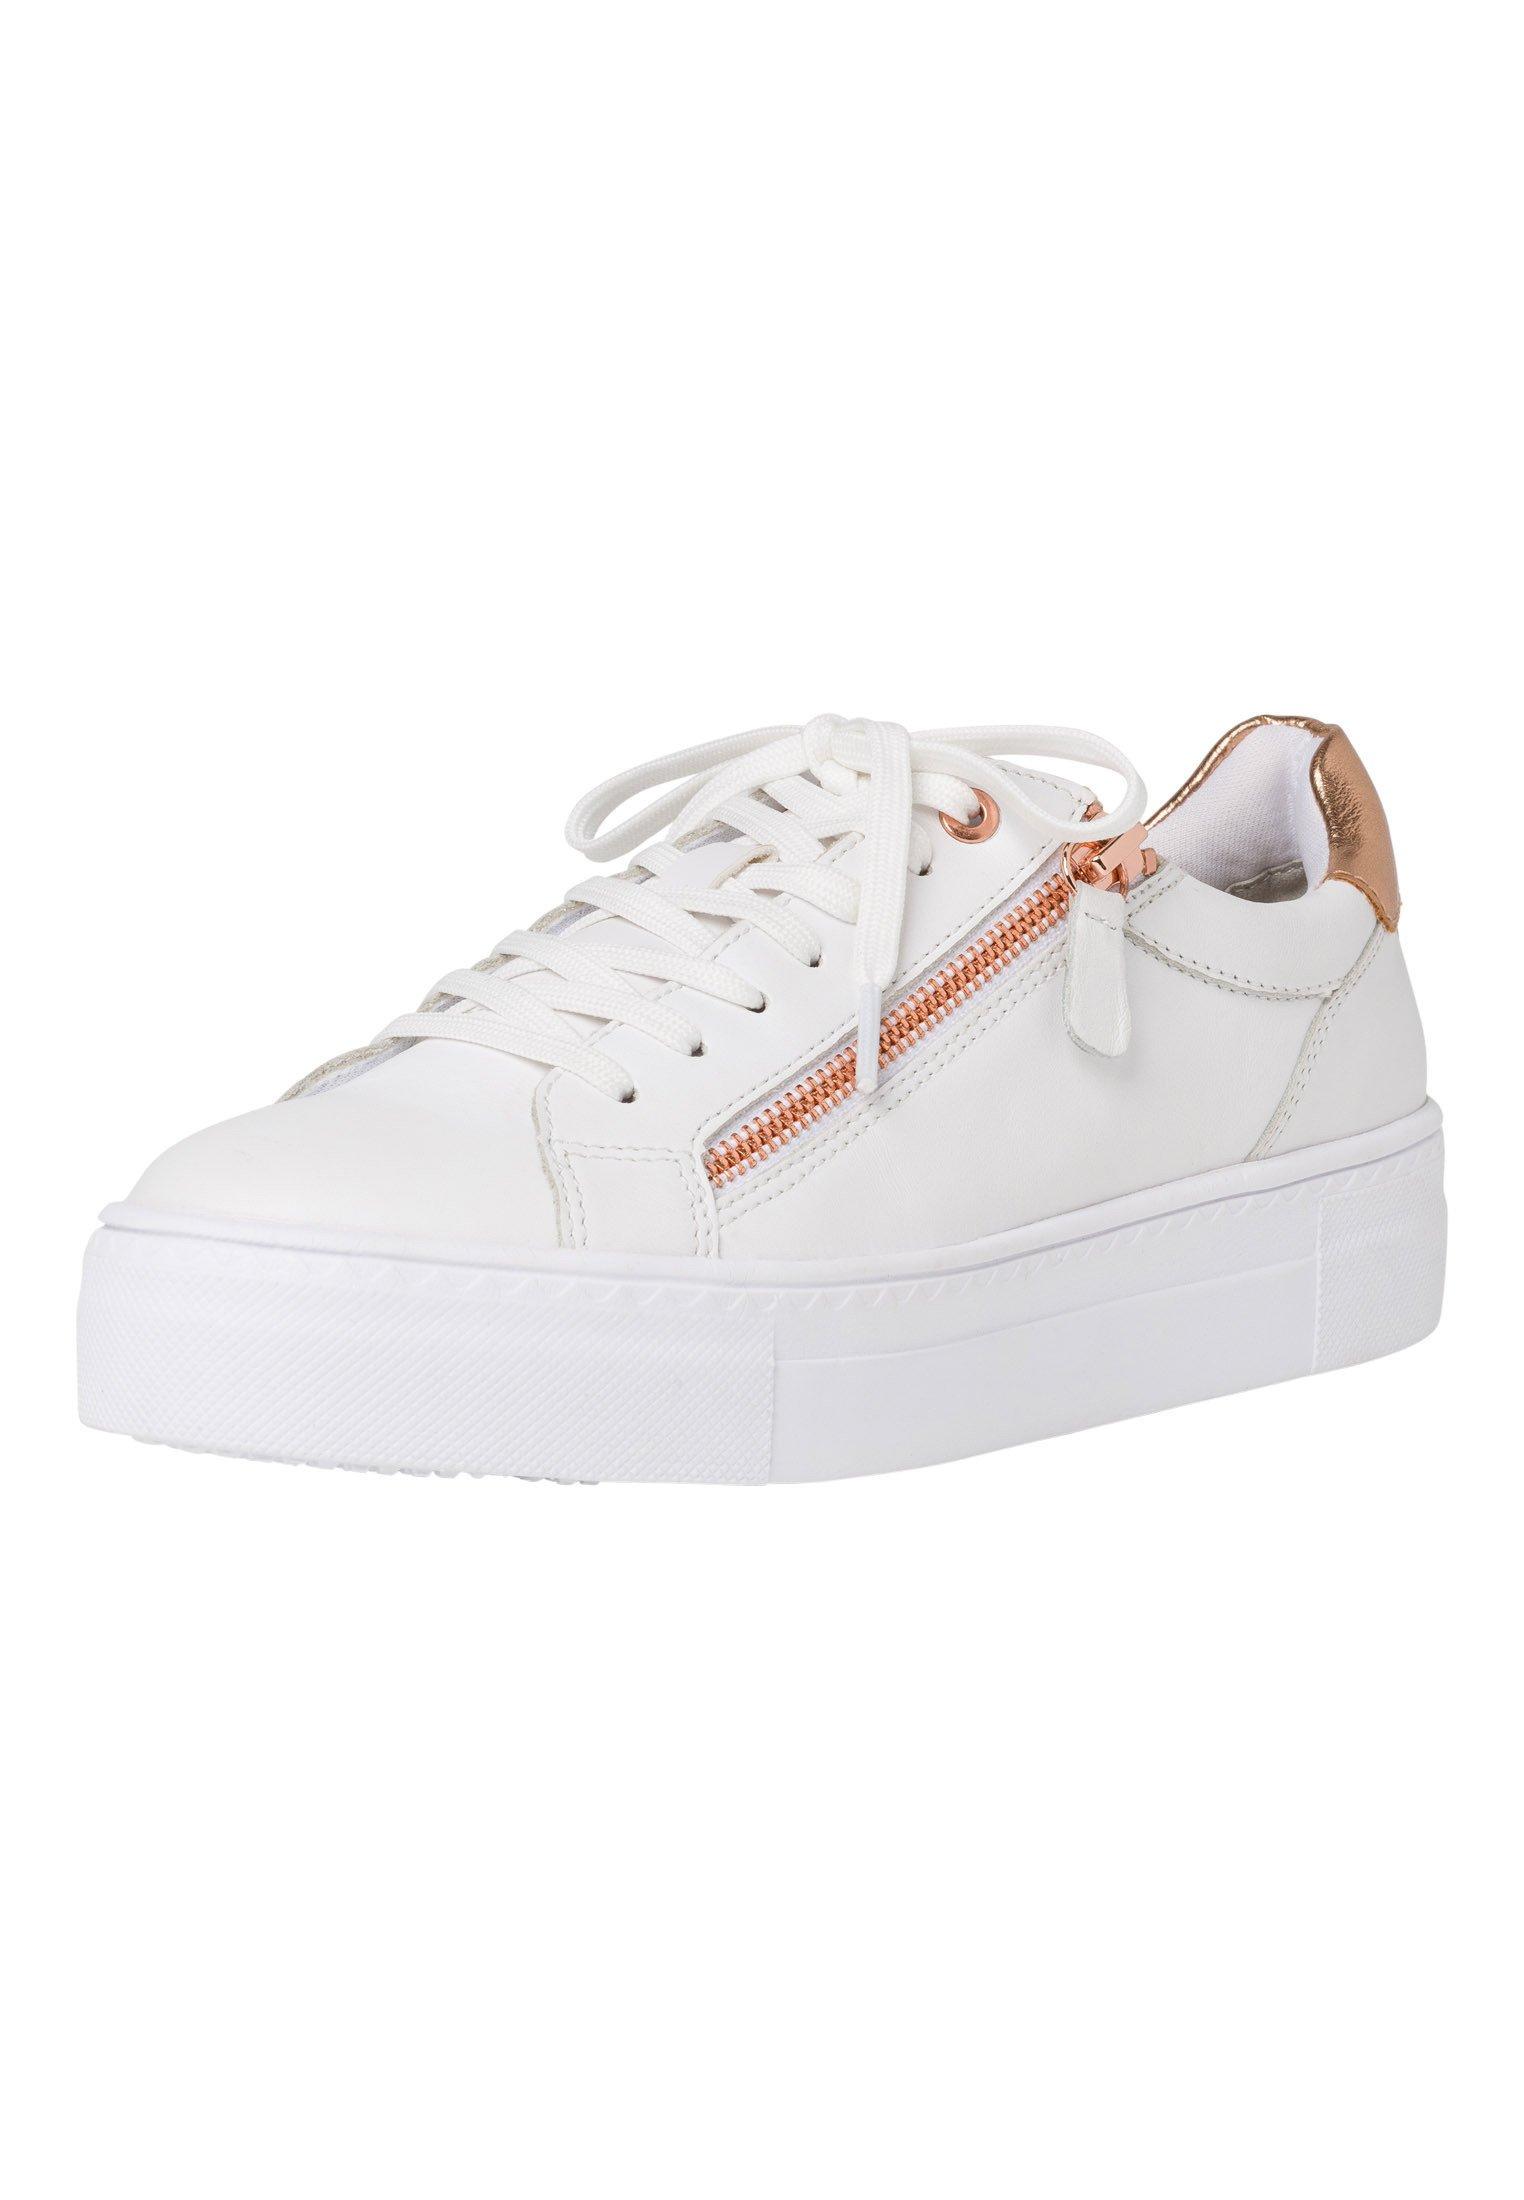 Tamaris Sneaker - Sneakers White